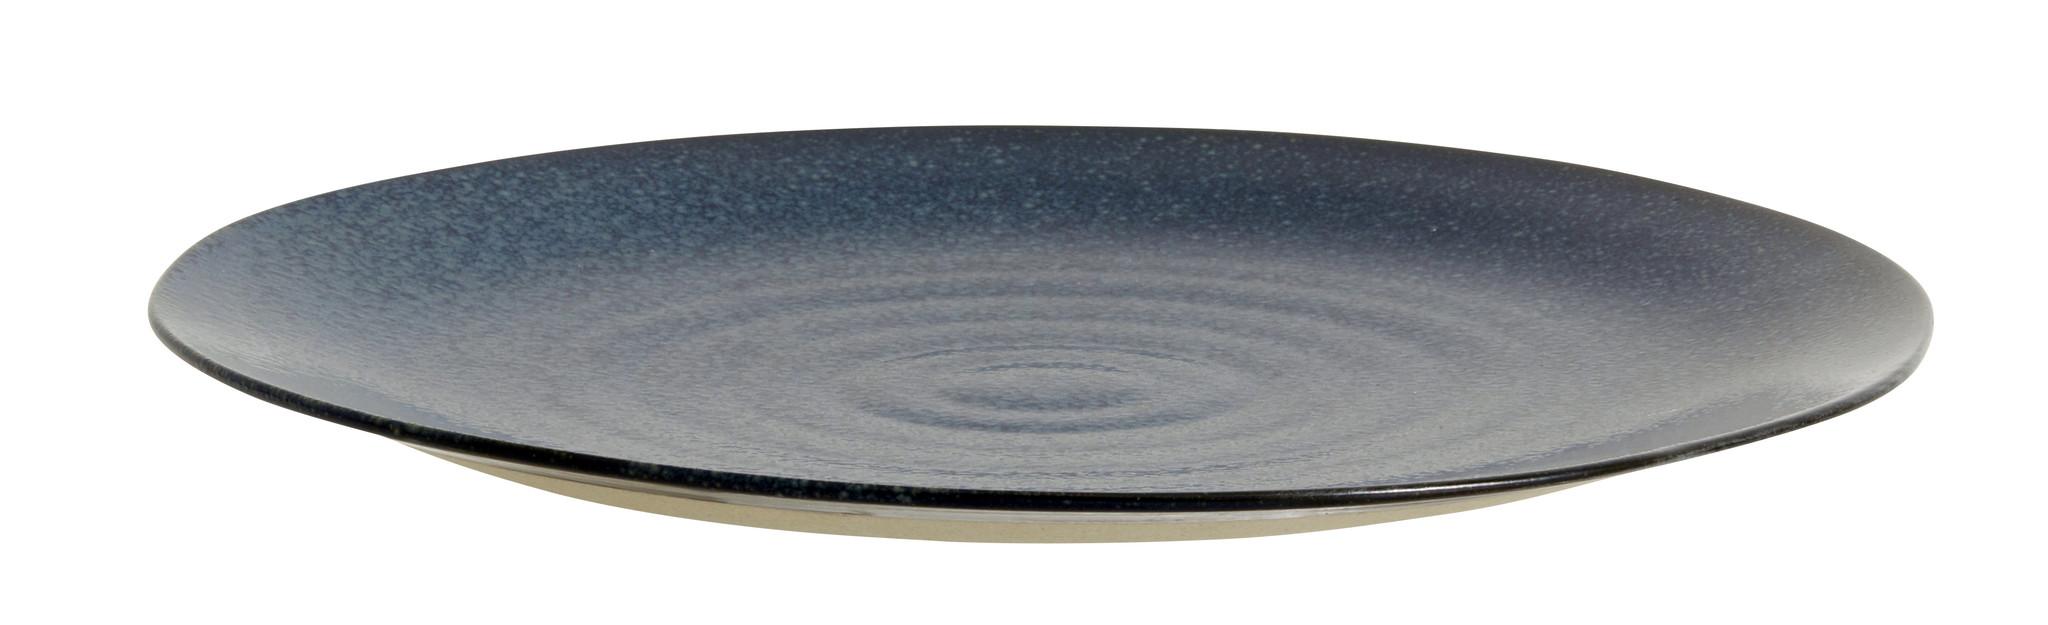 Nordal Grainy dinerbord ø 28 cm - donkerblauw - set van 4-57011-5708309157436